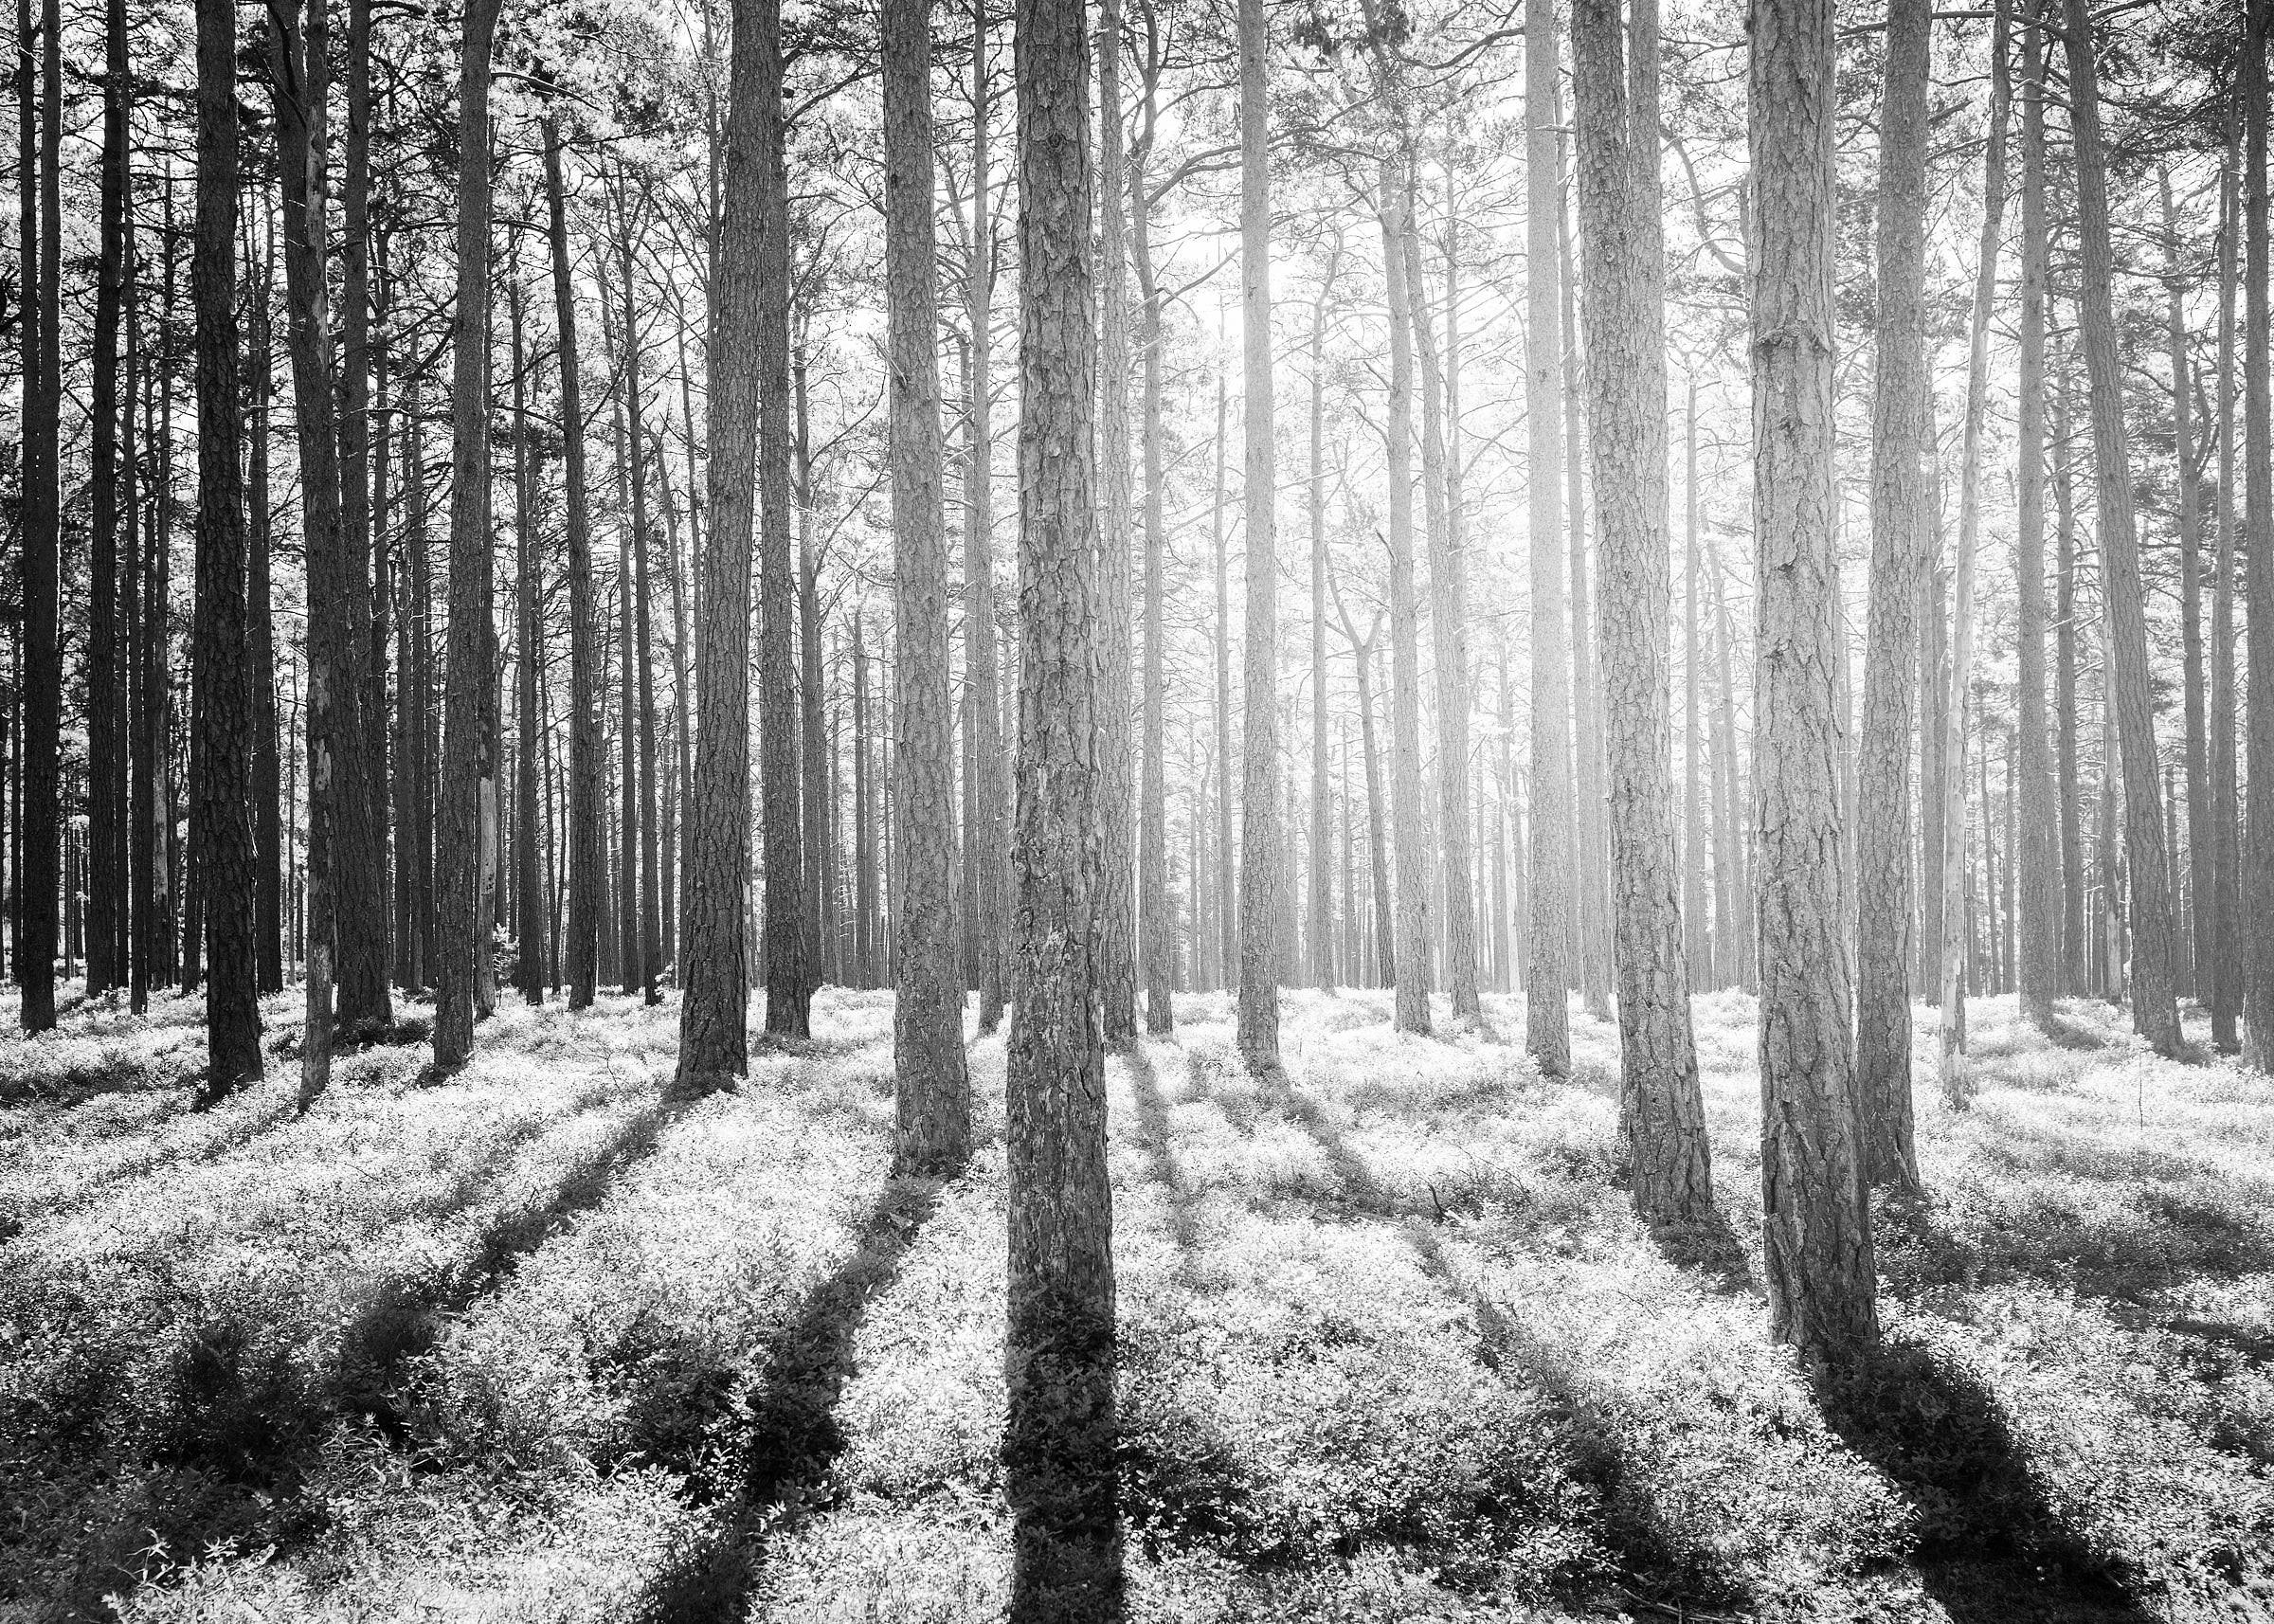 Portfolio_421_Landscape Scandinavian Forest DSC0580_KRISTOFER SAMUELSSON PHOTOGRAPHY.jpg